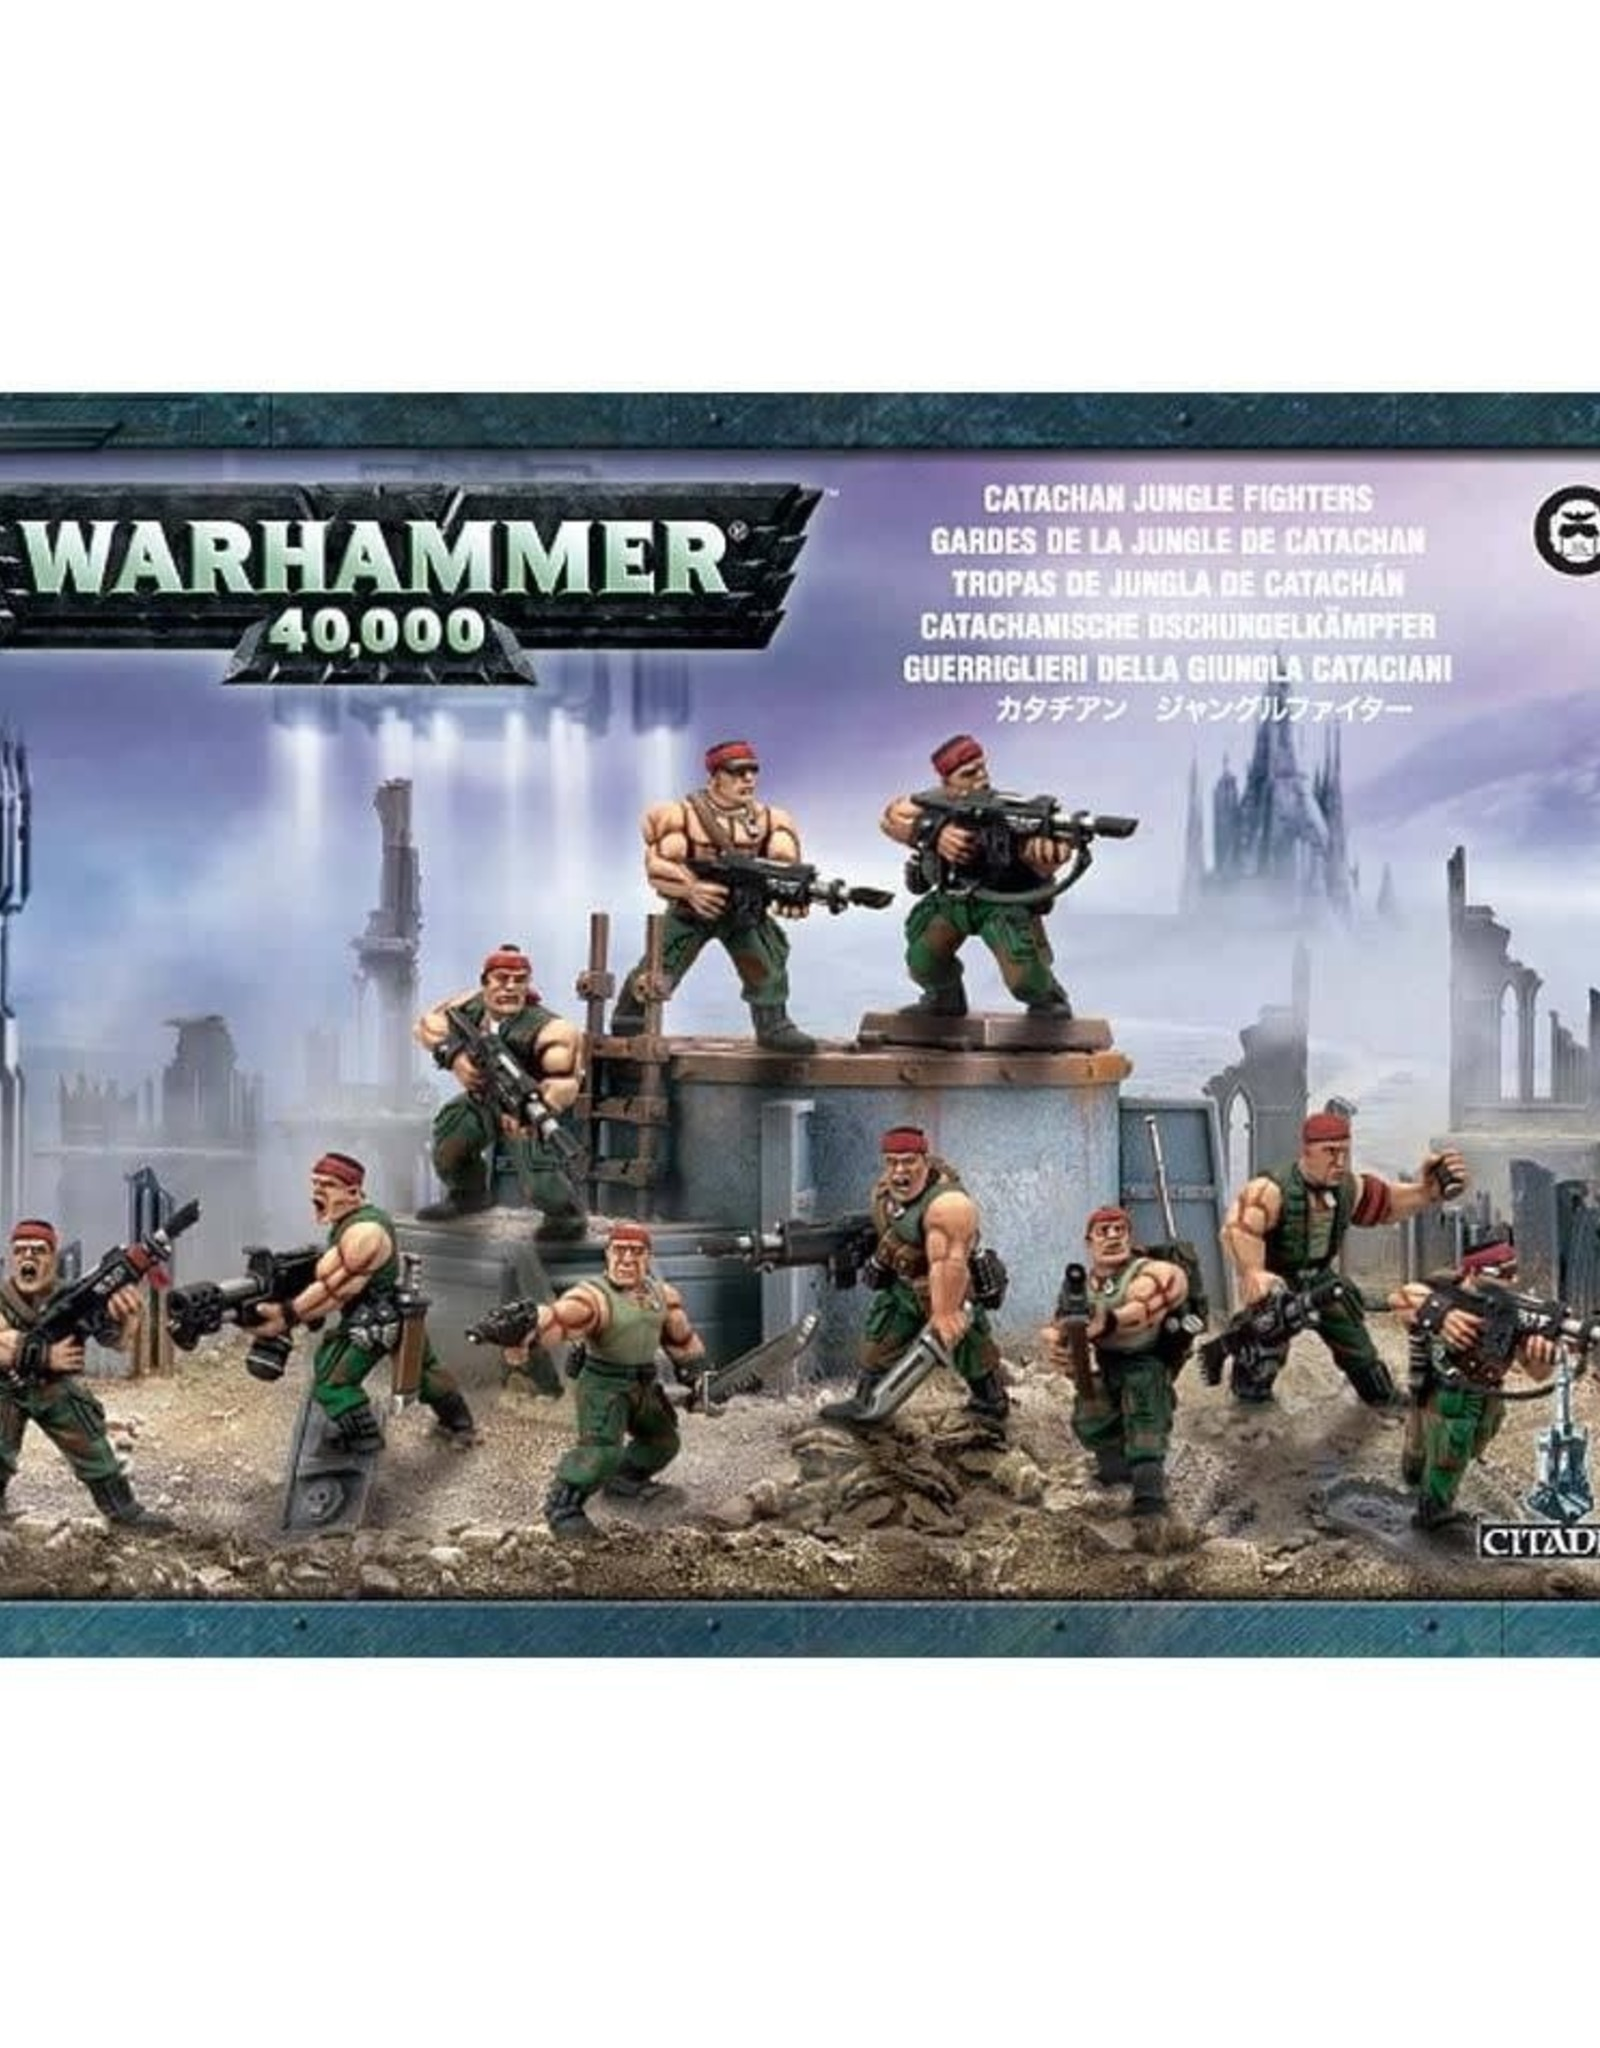 Warhammer 40K Catachan Jungle Fighters